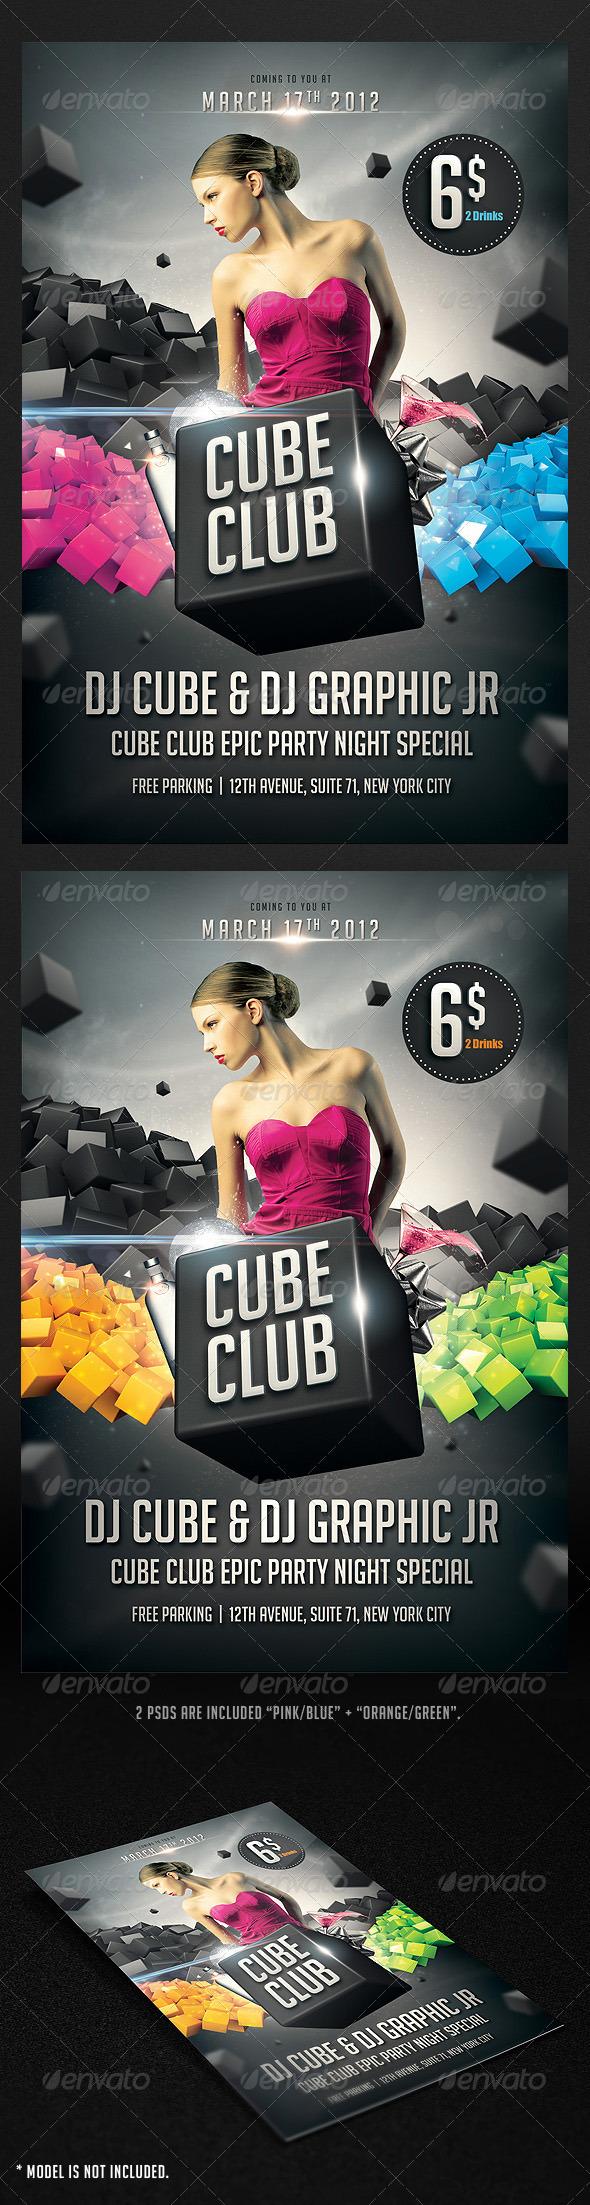 GraphicRiver Cube Club Flyer 1747762